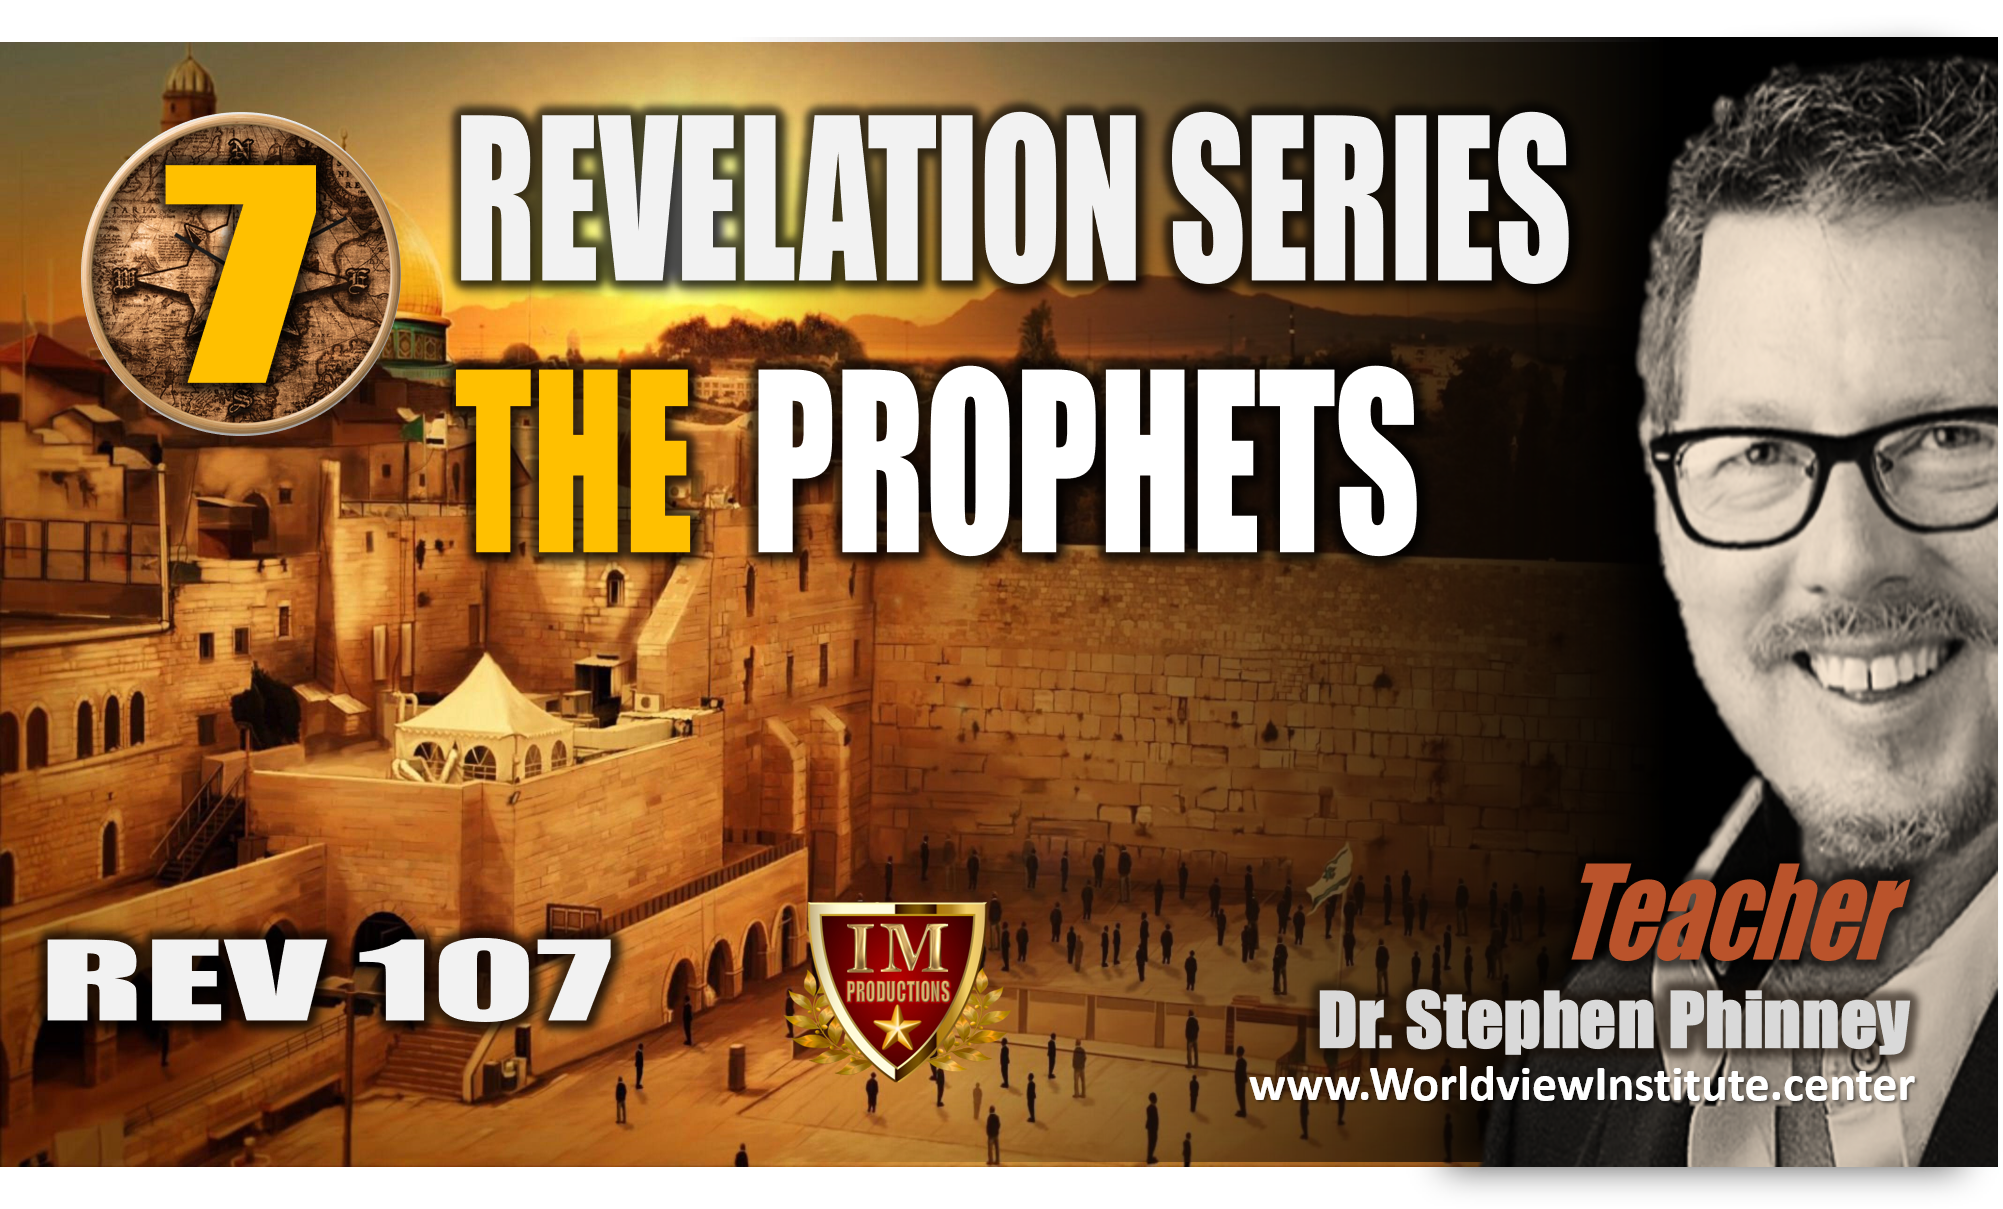 REV 107 | The Prophets